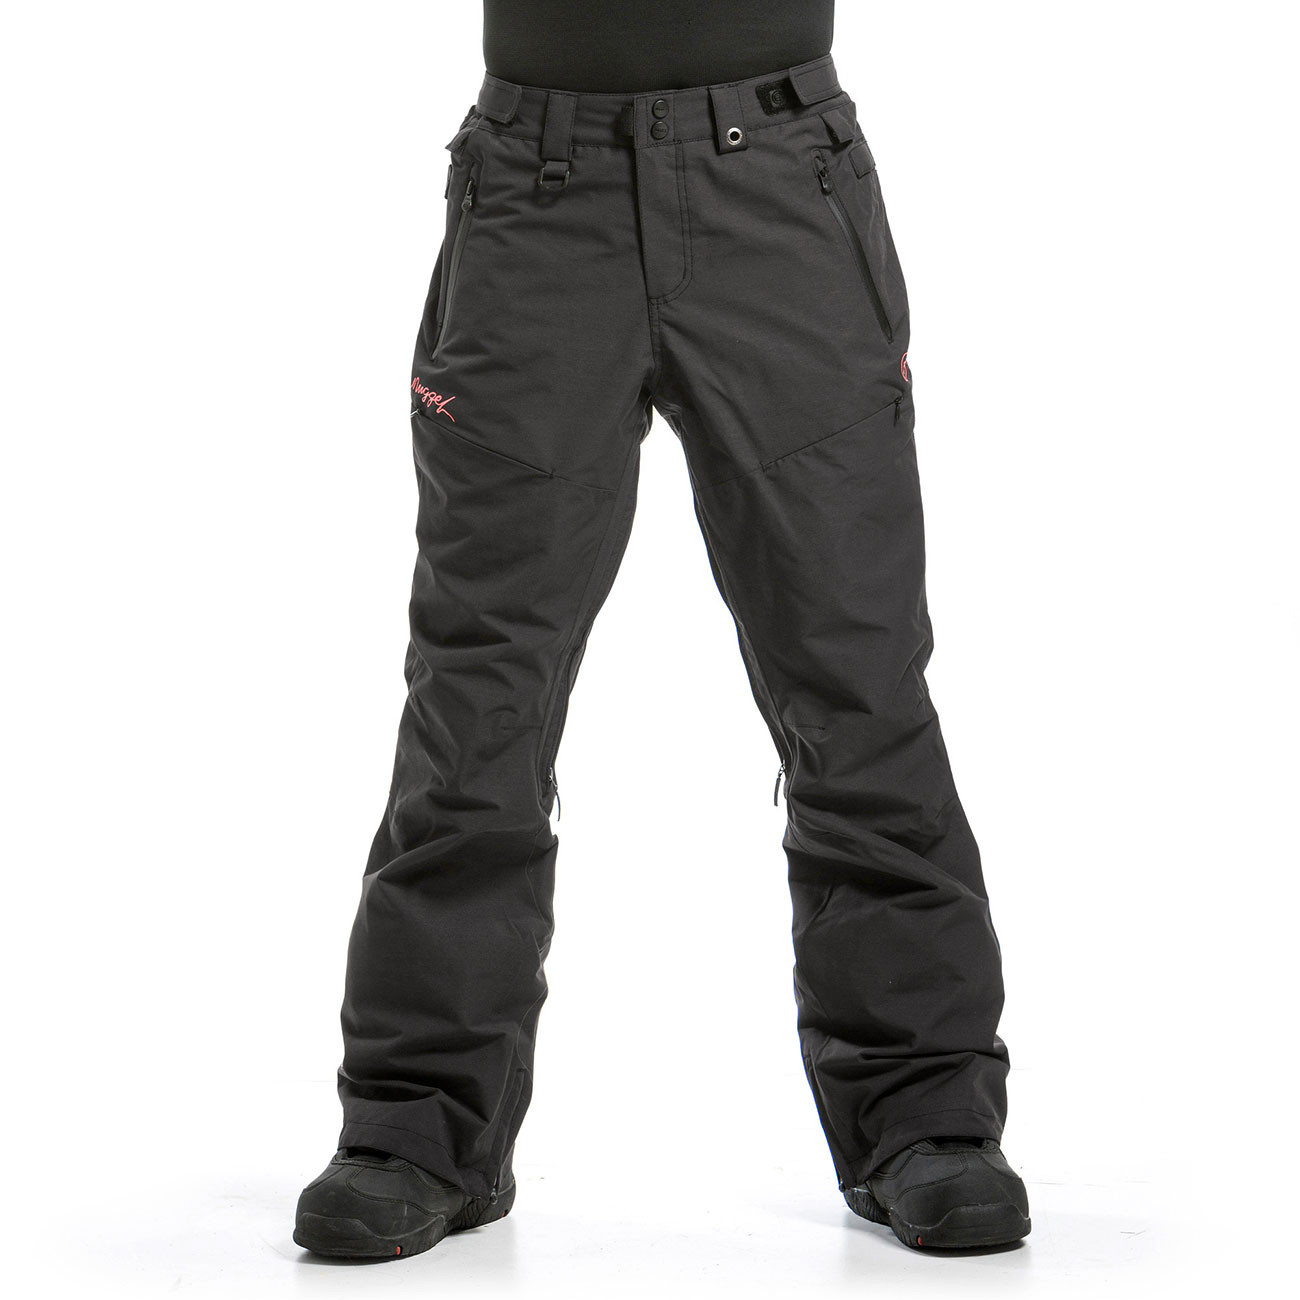 Kalhoty Nugget Vivid 3 black